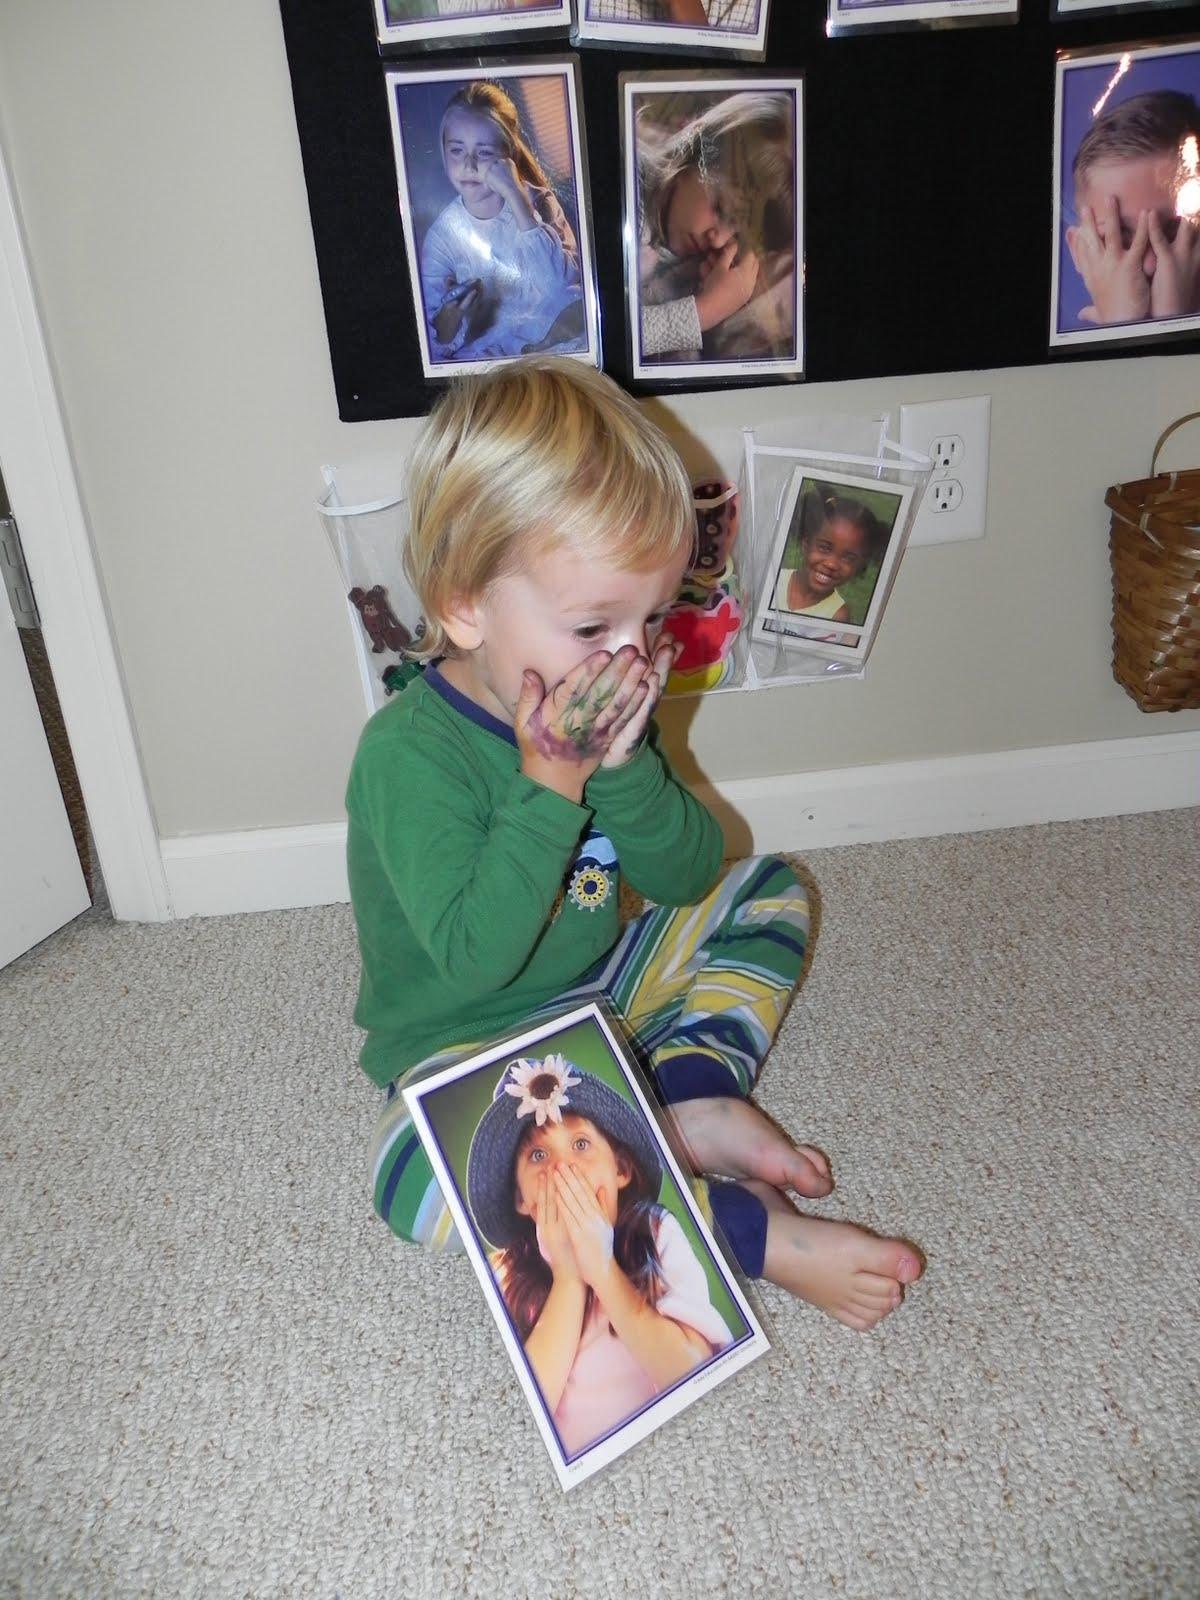 Teaching Emotional Intelligence During Play